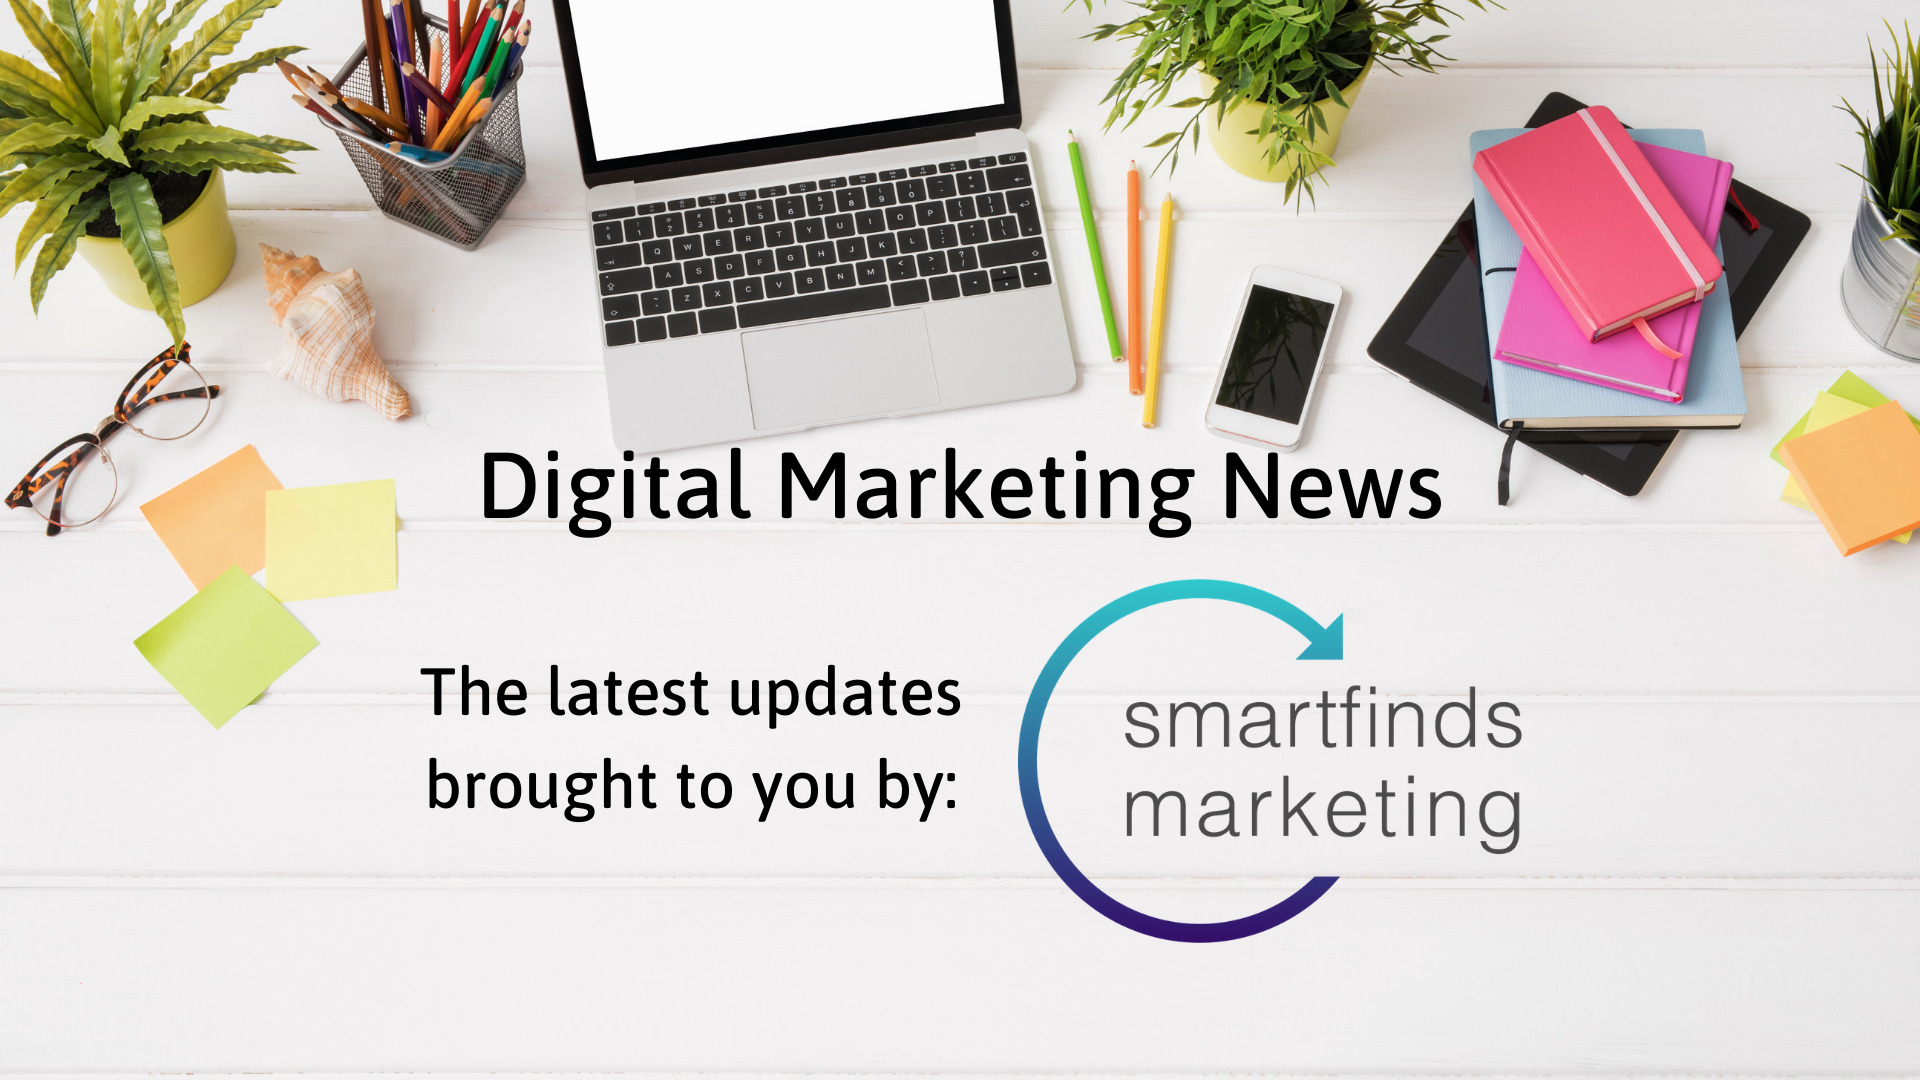 SmartFinds Marketing Digital Marketing News